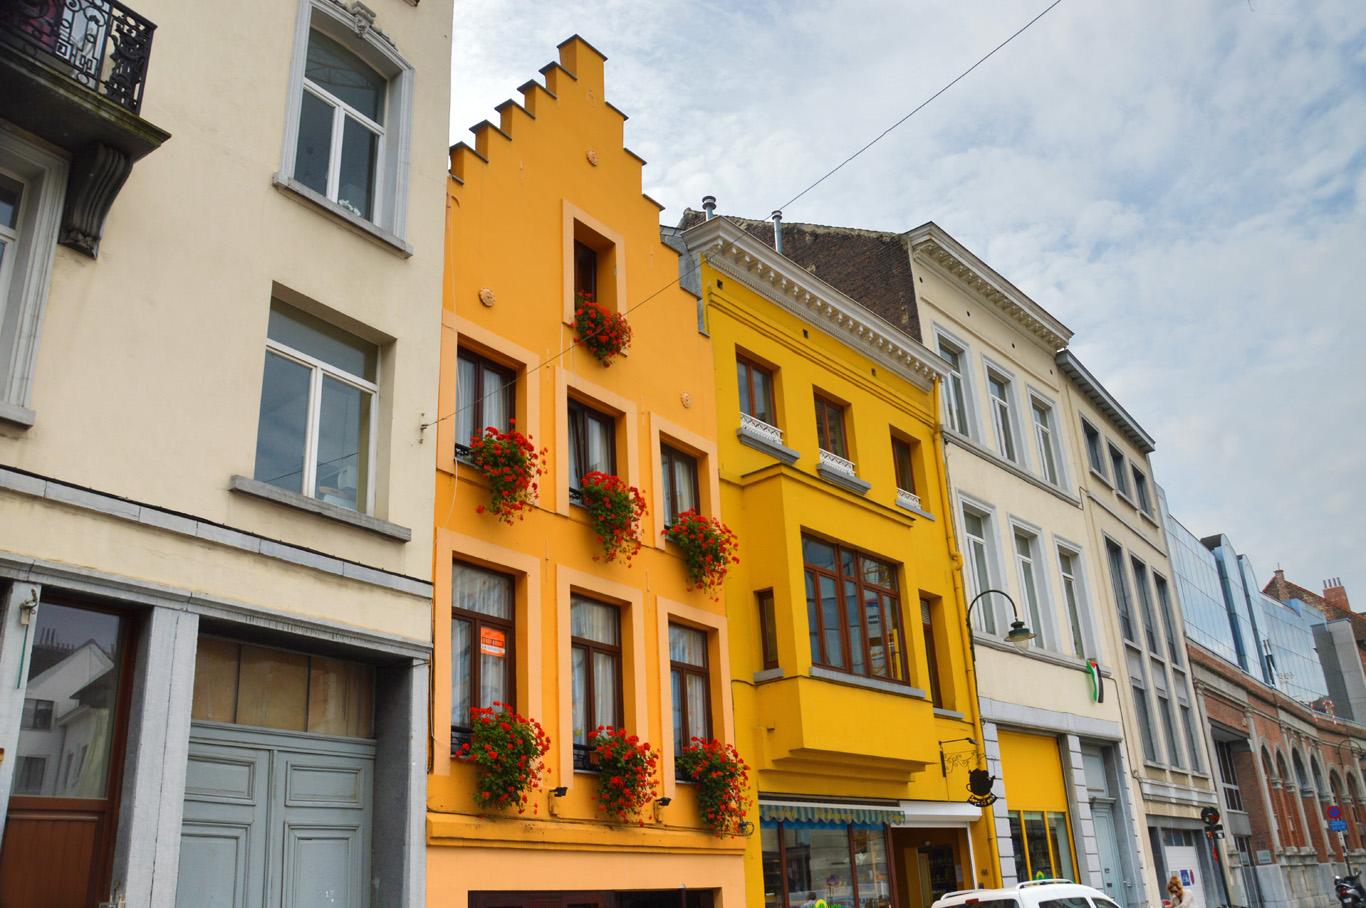 Few colorful buildings